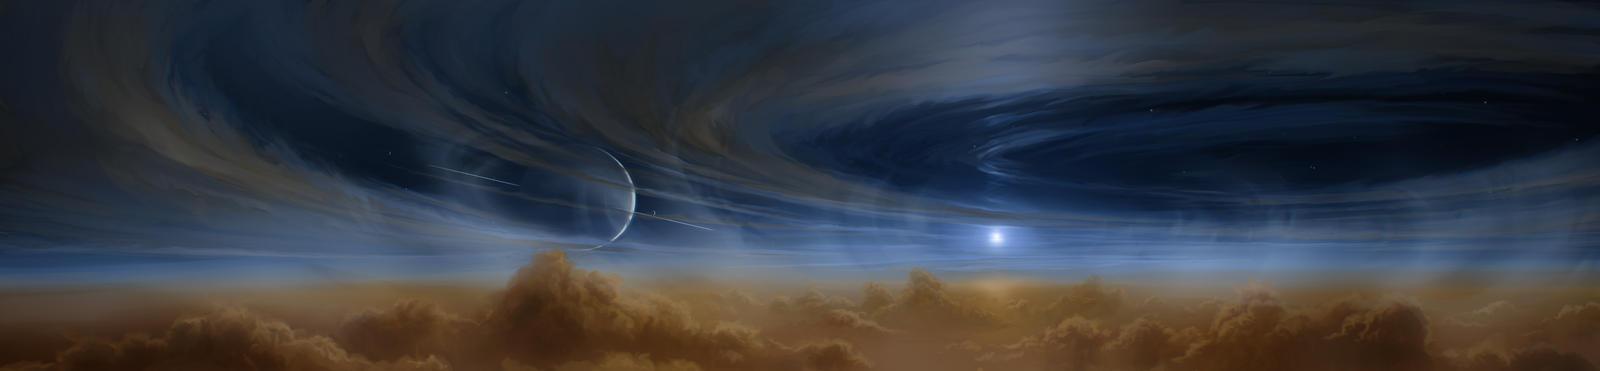 Titan by JustV23